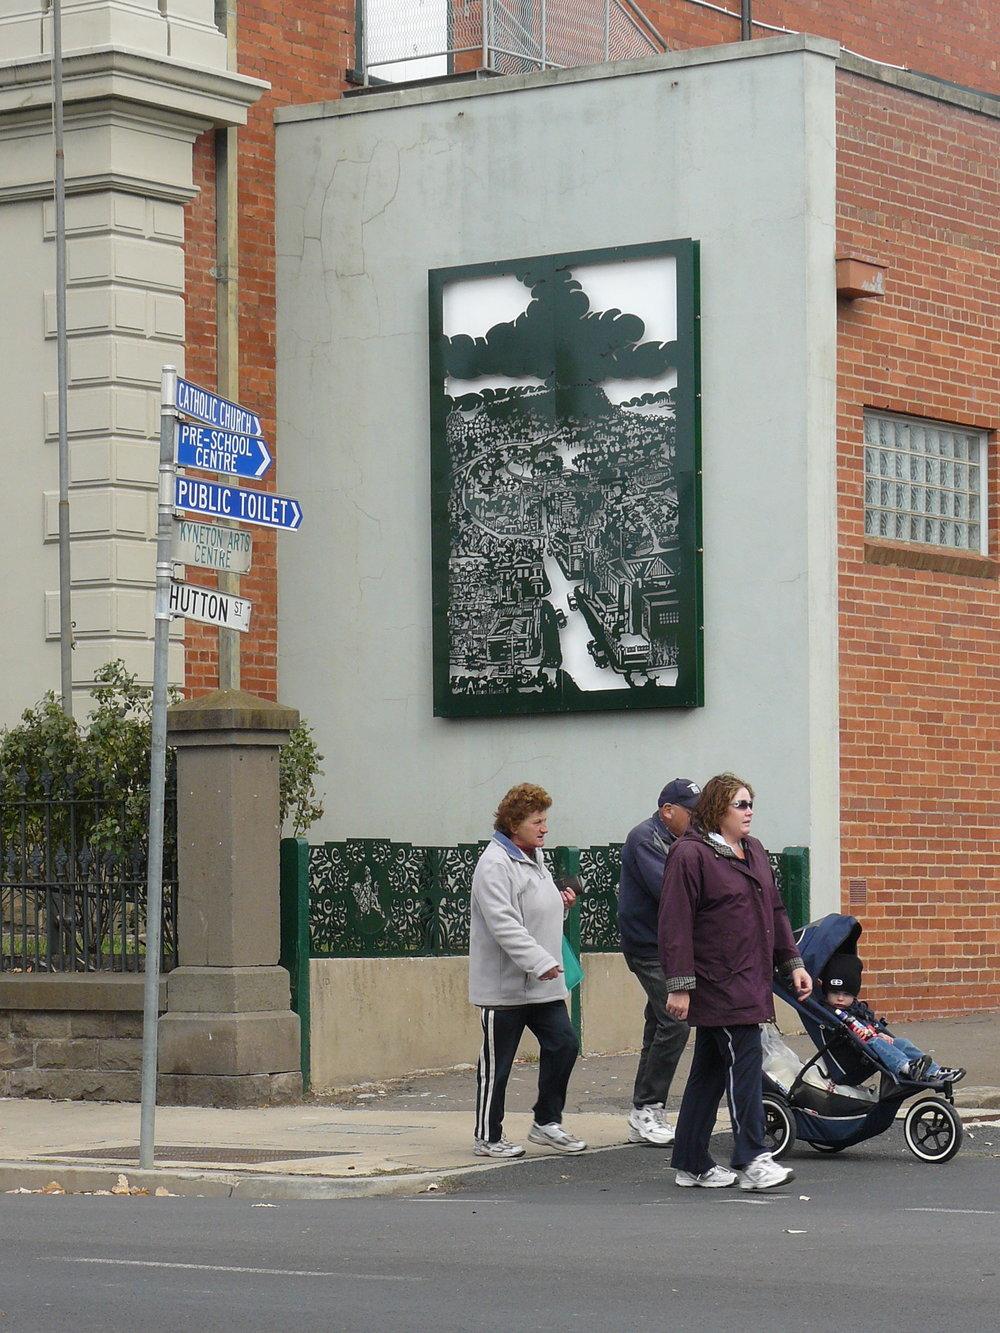 5 Hasell, Kyneton Wall Panel' lasercut steel, 2.5m by 5 m, Kyneton Town Hall, 2007.JPG